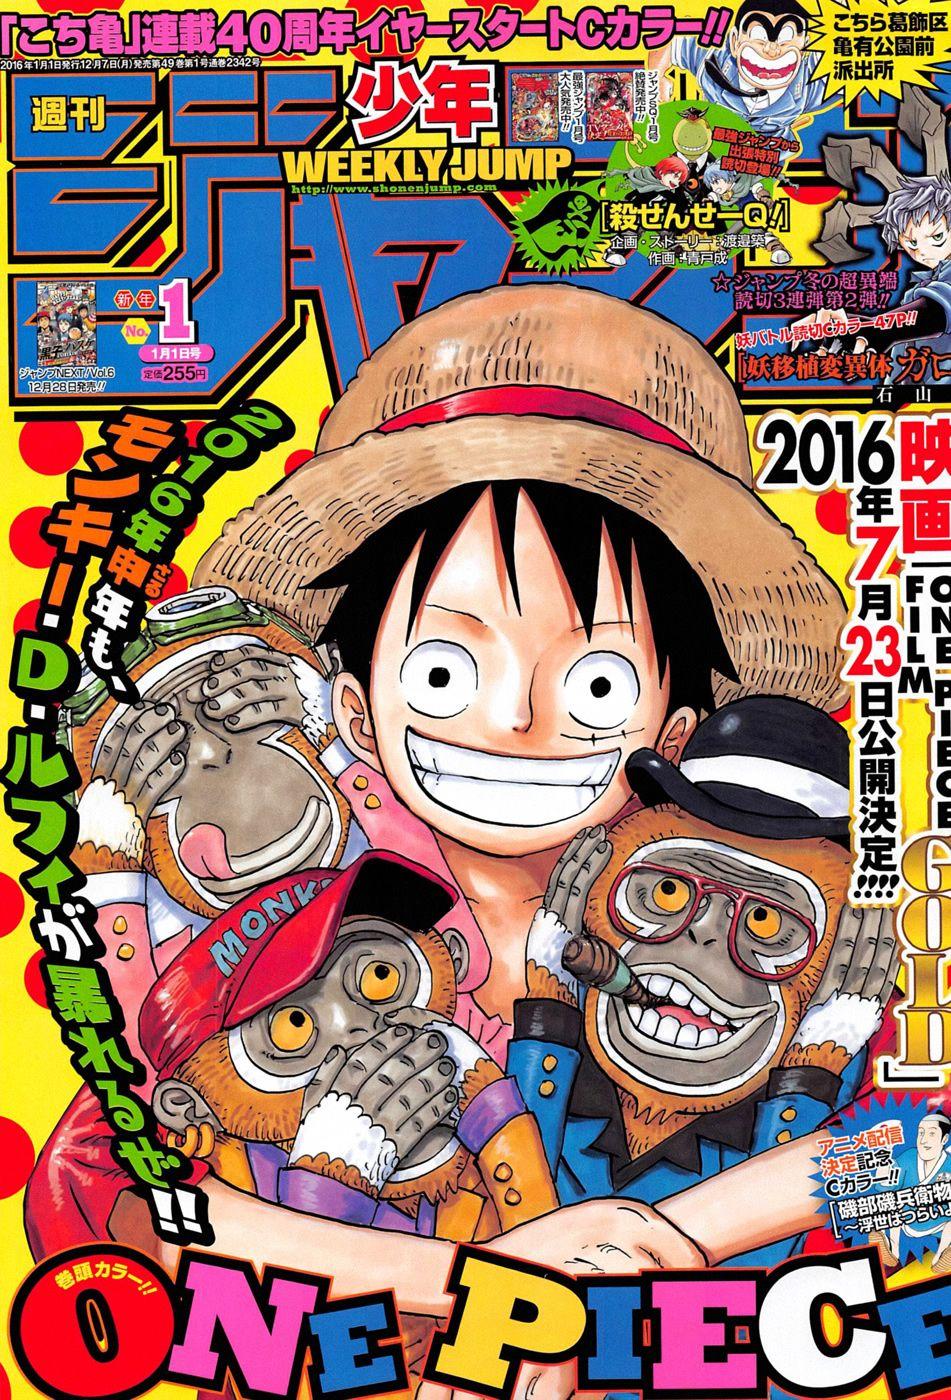 Ranking semanal de la revista Weekly Shonen Jump primera